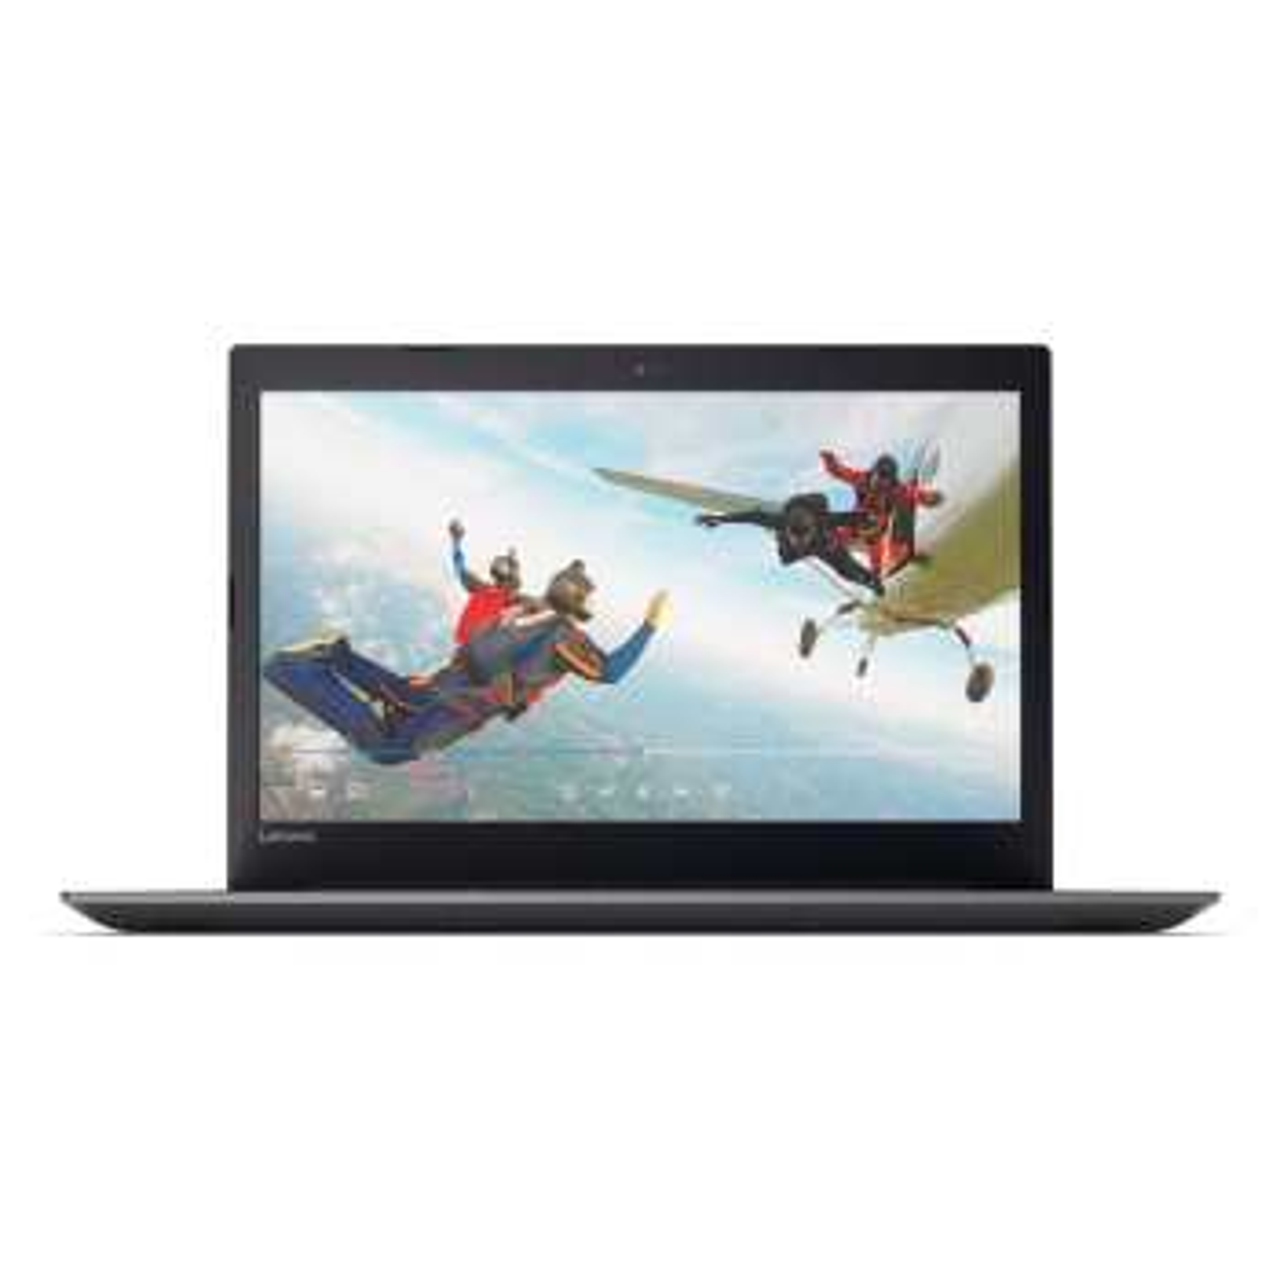 لپ تاپ 15 اینچی لنوو مدل Ideapad 320 - L | Lenovo Ideapad 320 - L - 15 inch Laptop